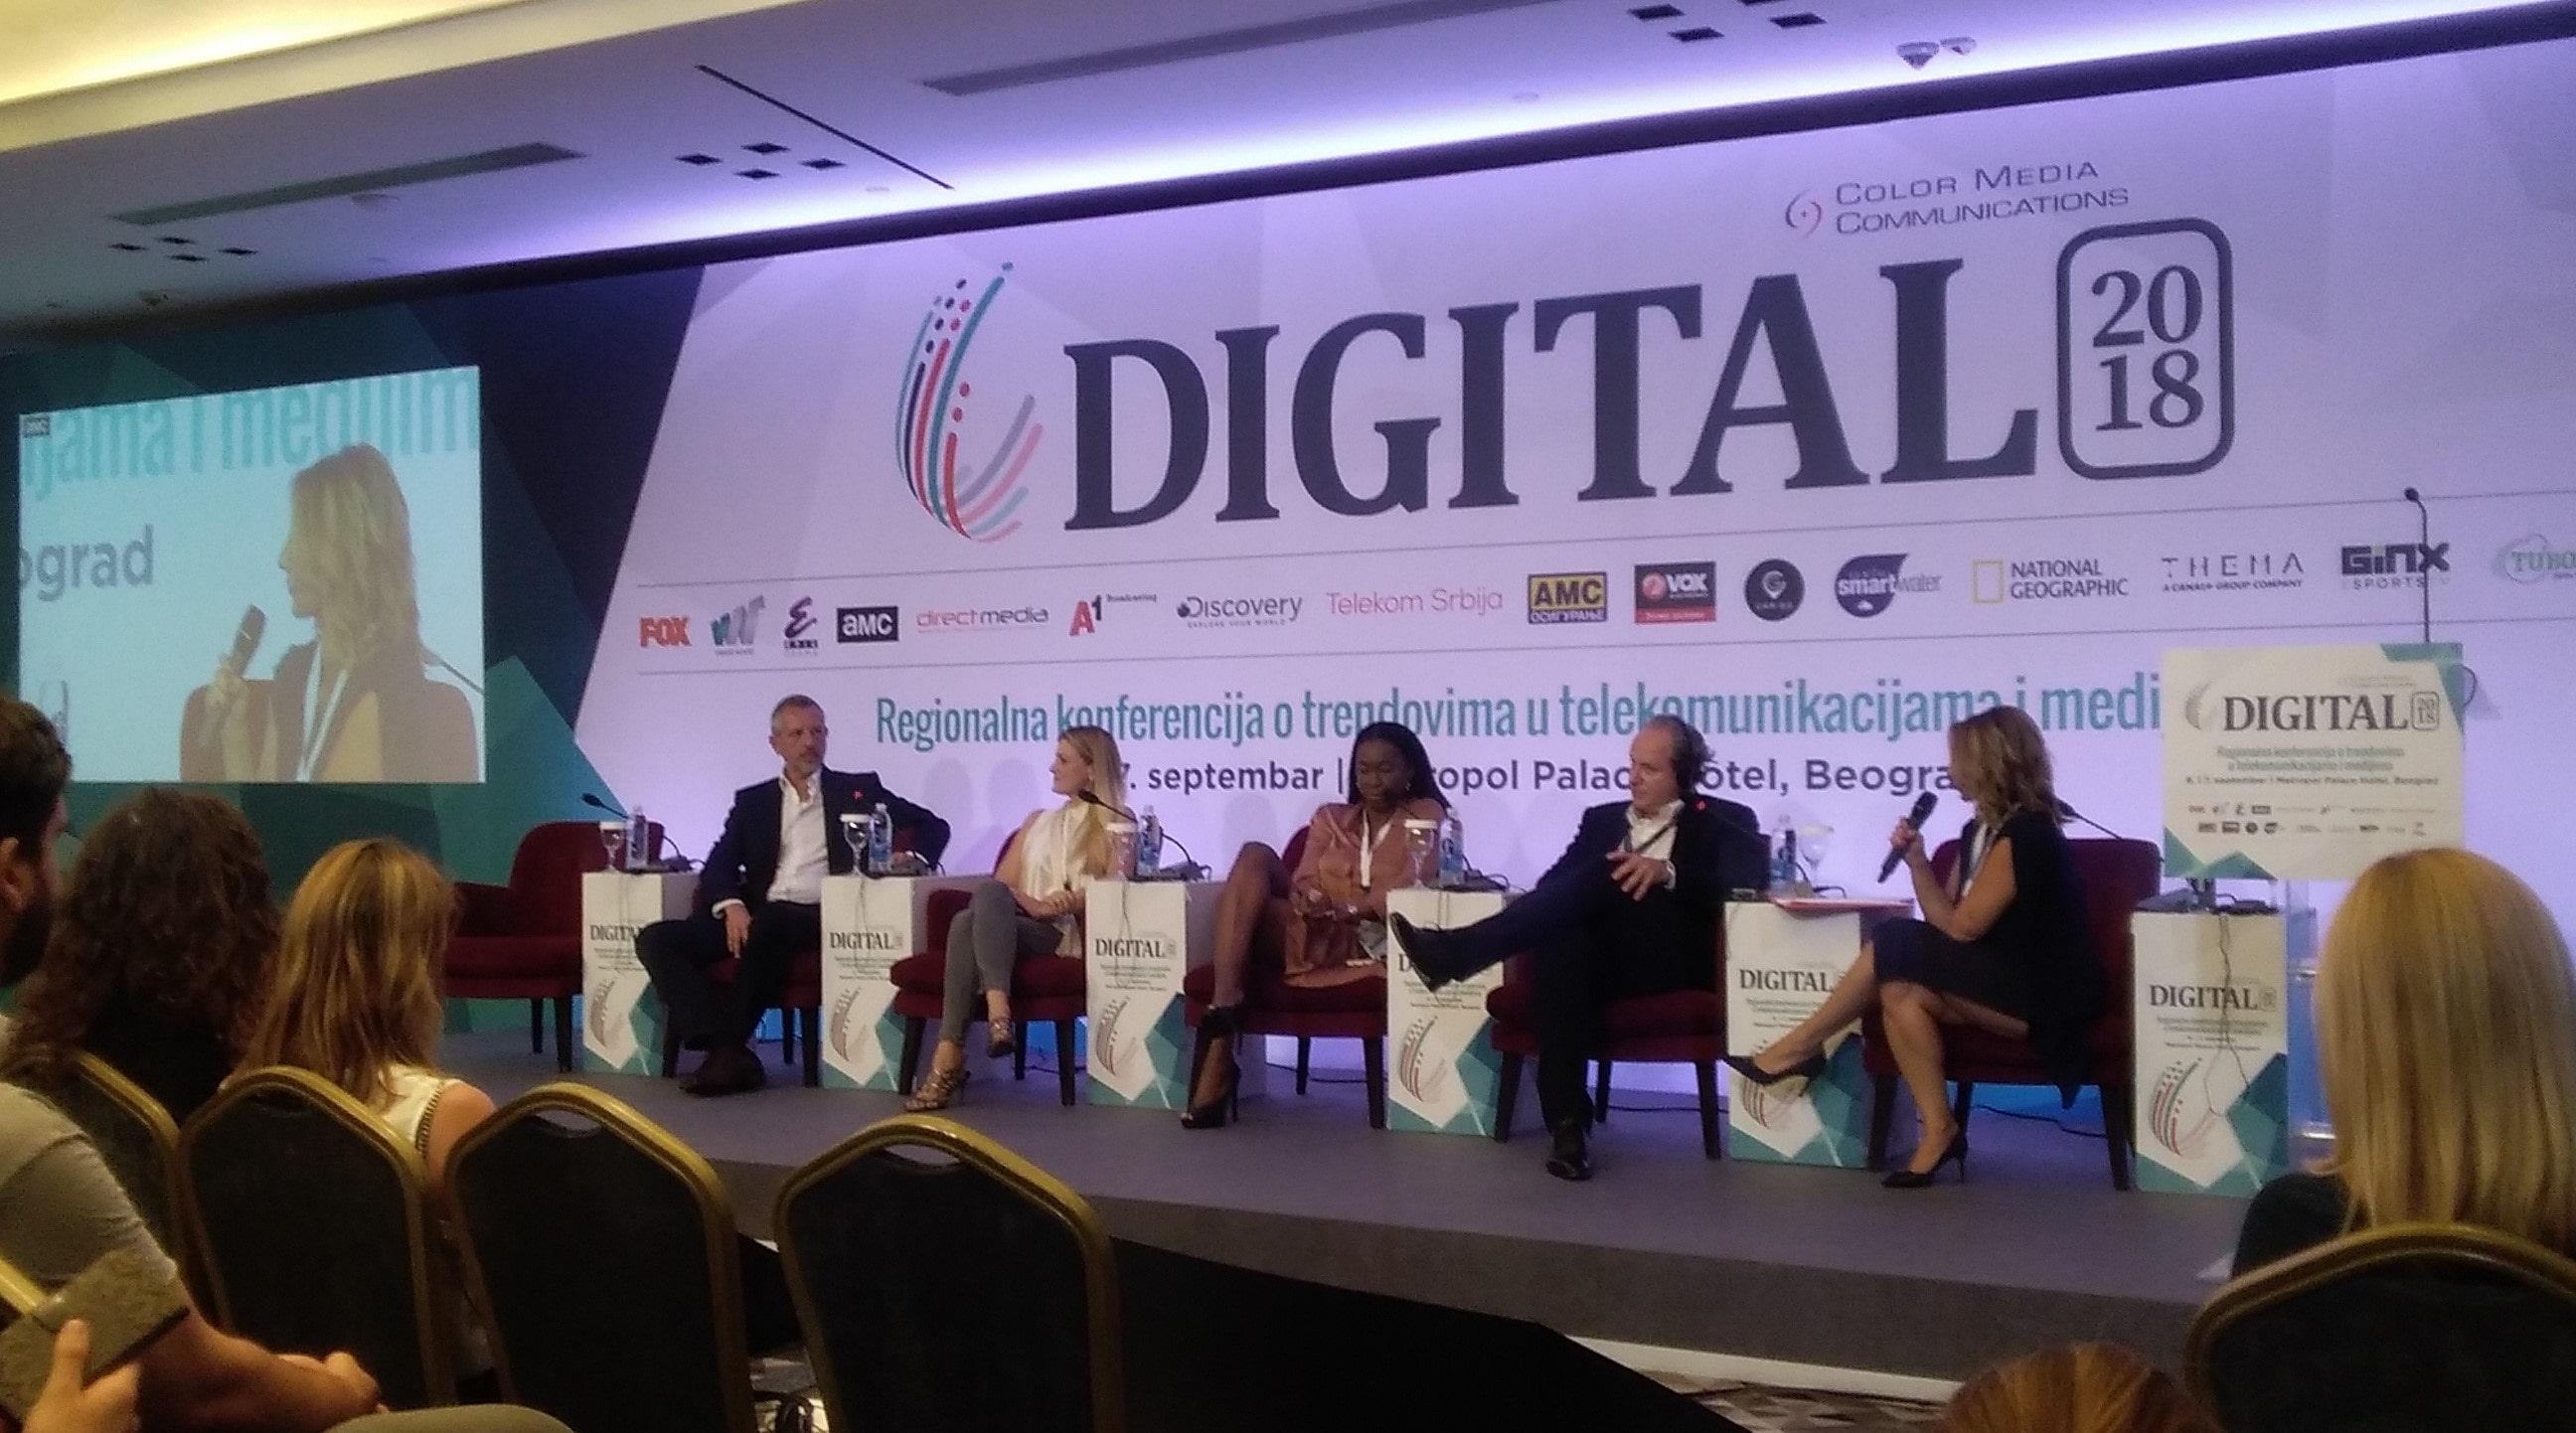 Strani i domaći gosti na DIGITAL 2018 konferenciji  © According to Kristina